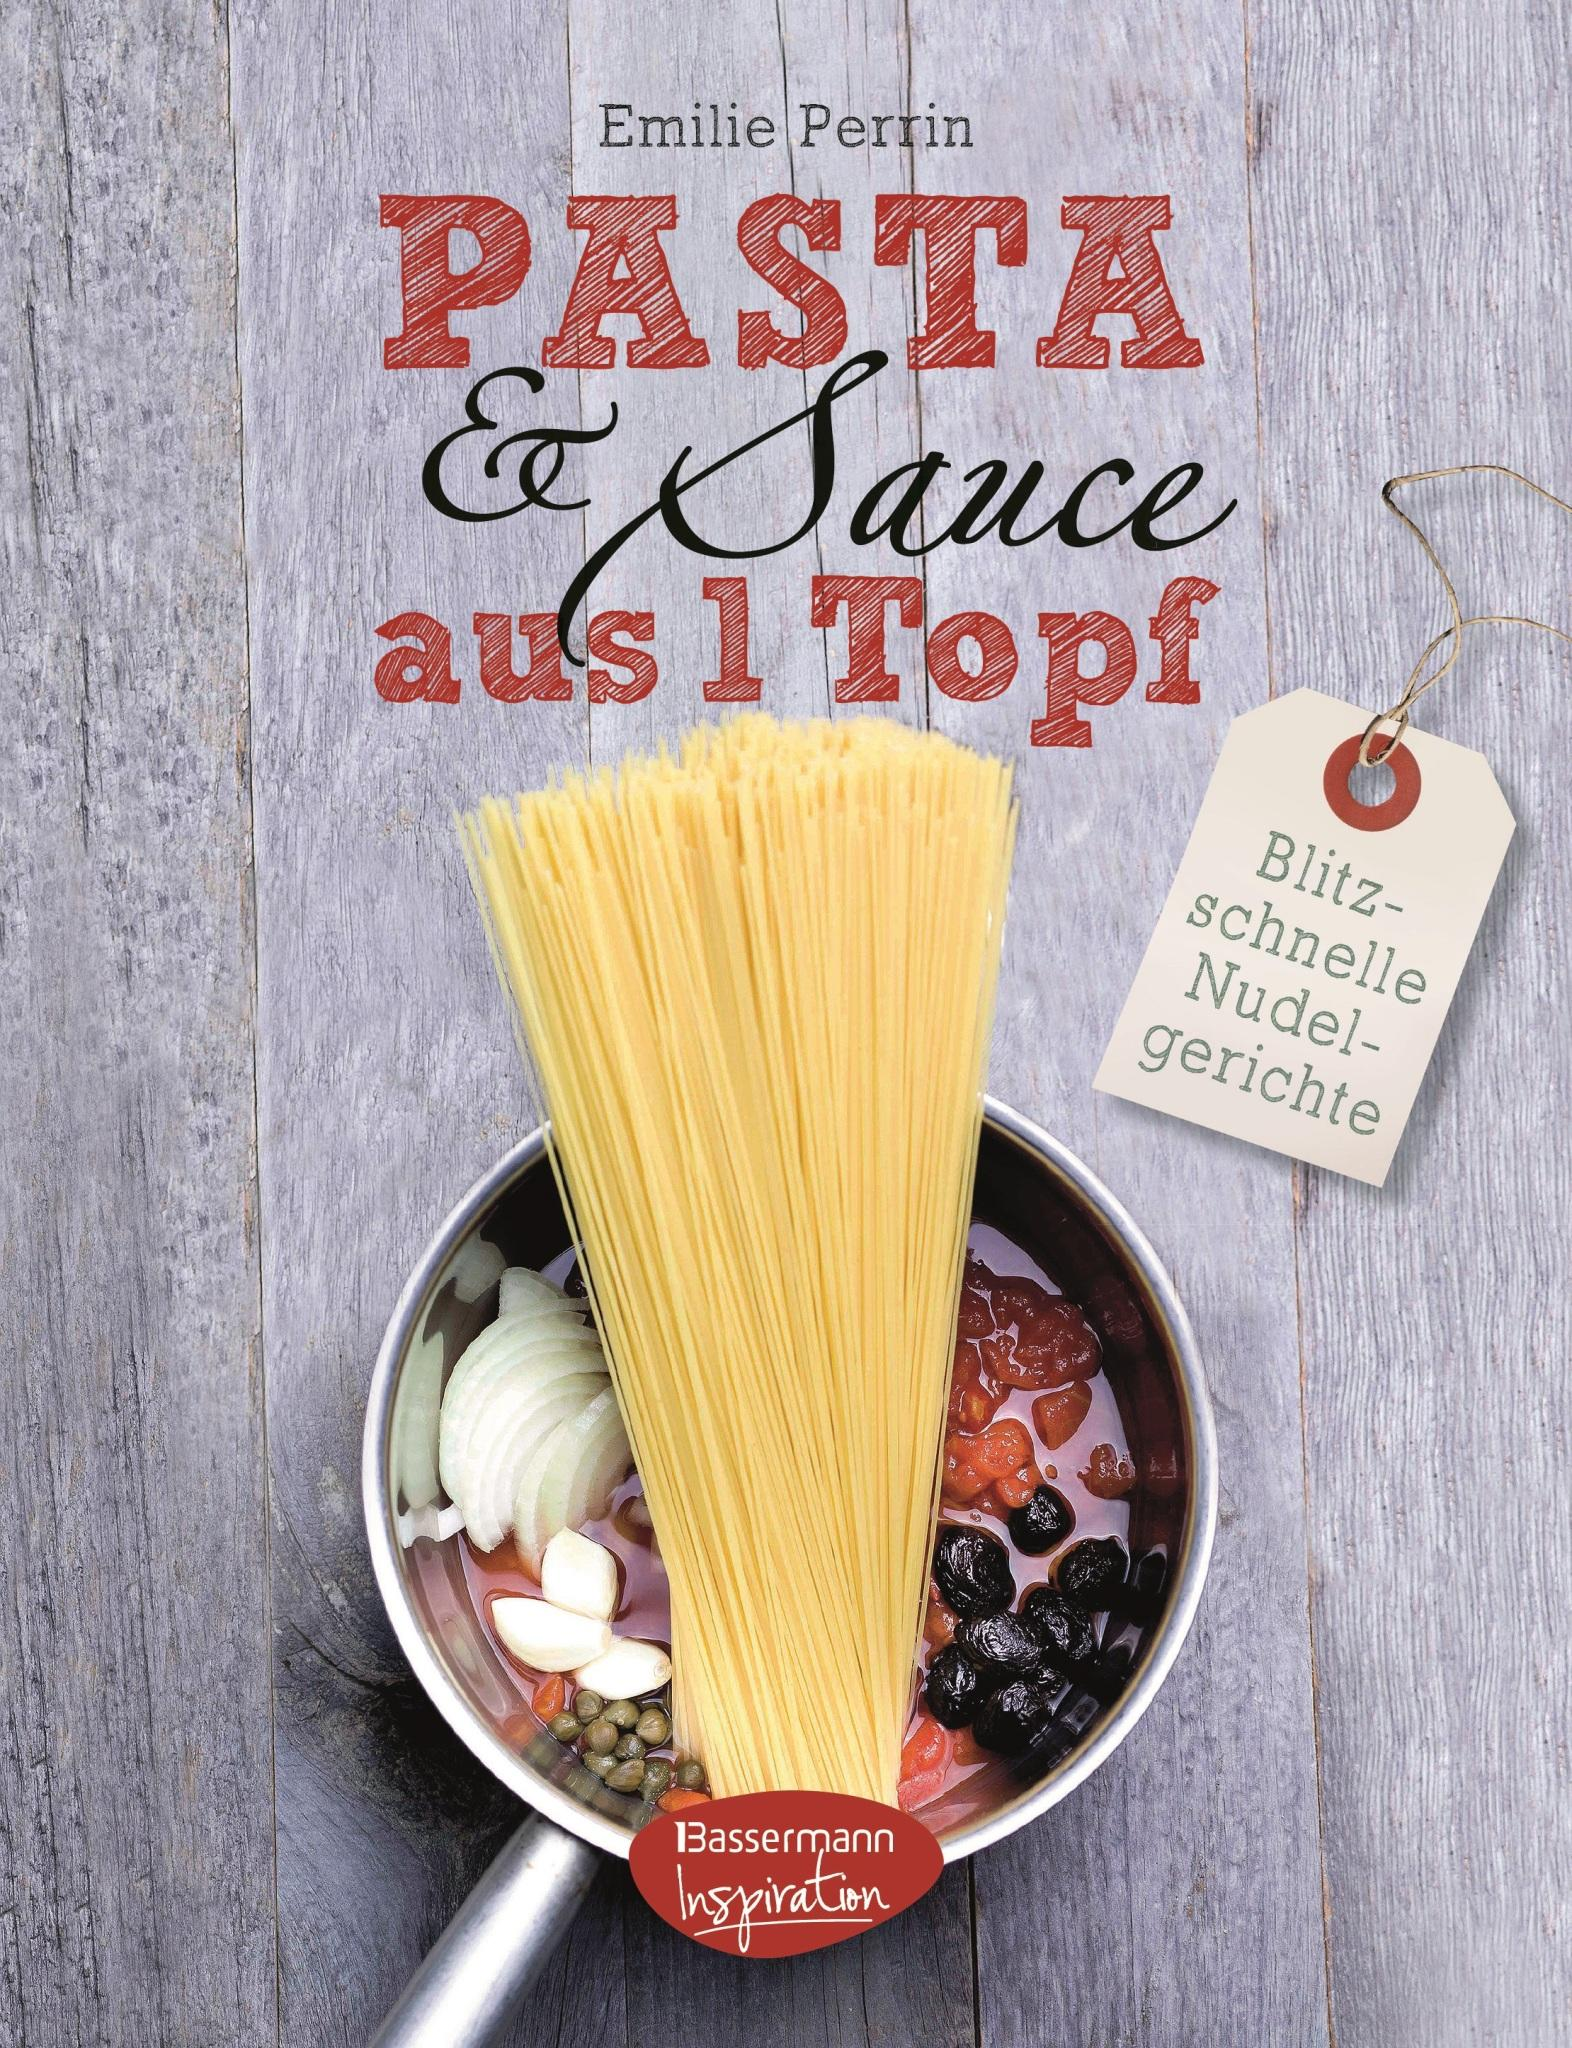 39 pasta sauce aus einem topf 39 schnelle rezepte f r one pot pasta. Black Bedroom Furniture Sets. Home Design Ideas